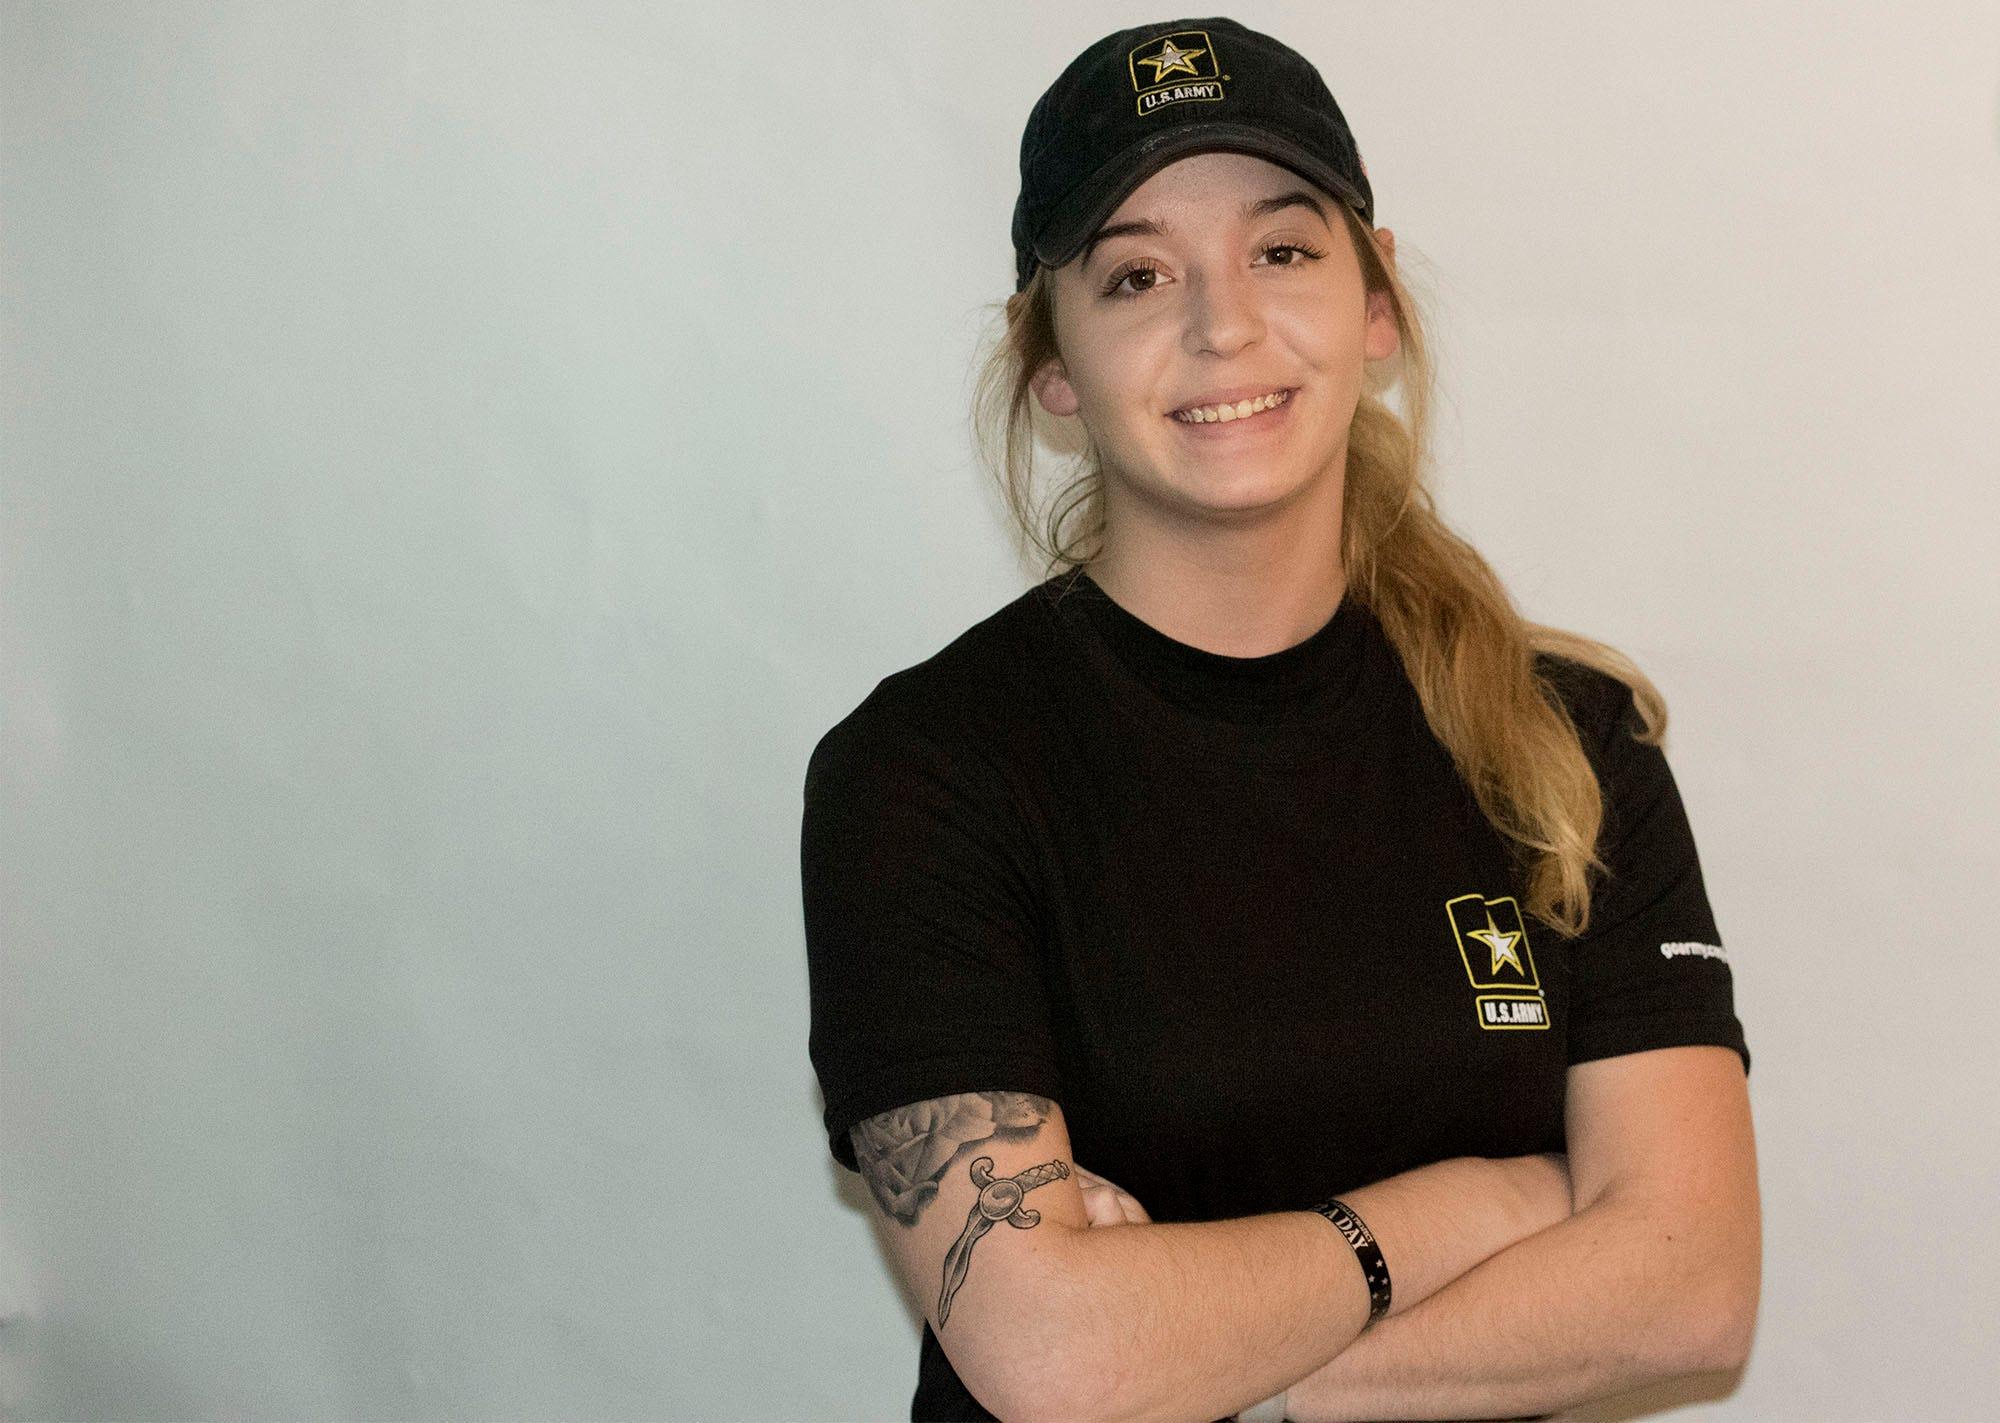 Breana Stine, Waynesboro, will soon head to Fort Benning miltary base, Georgia, to train in infantry.